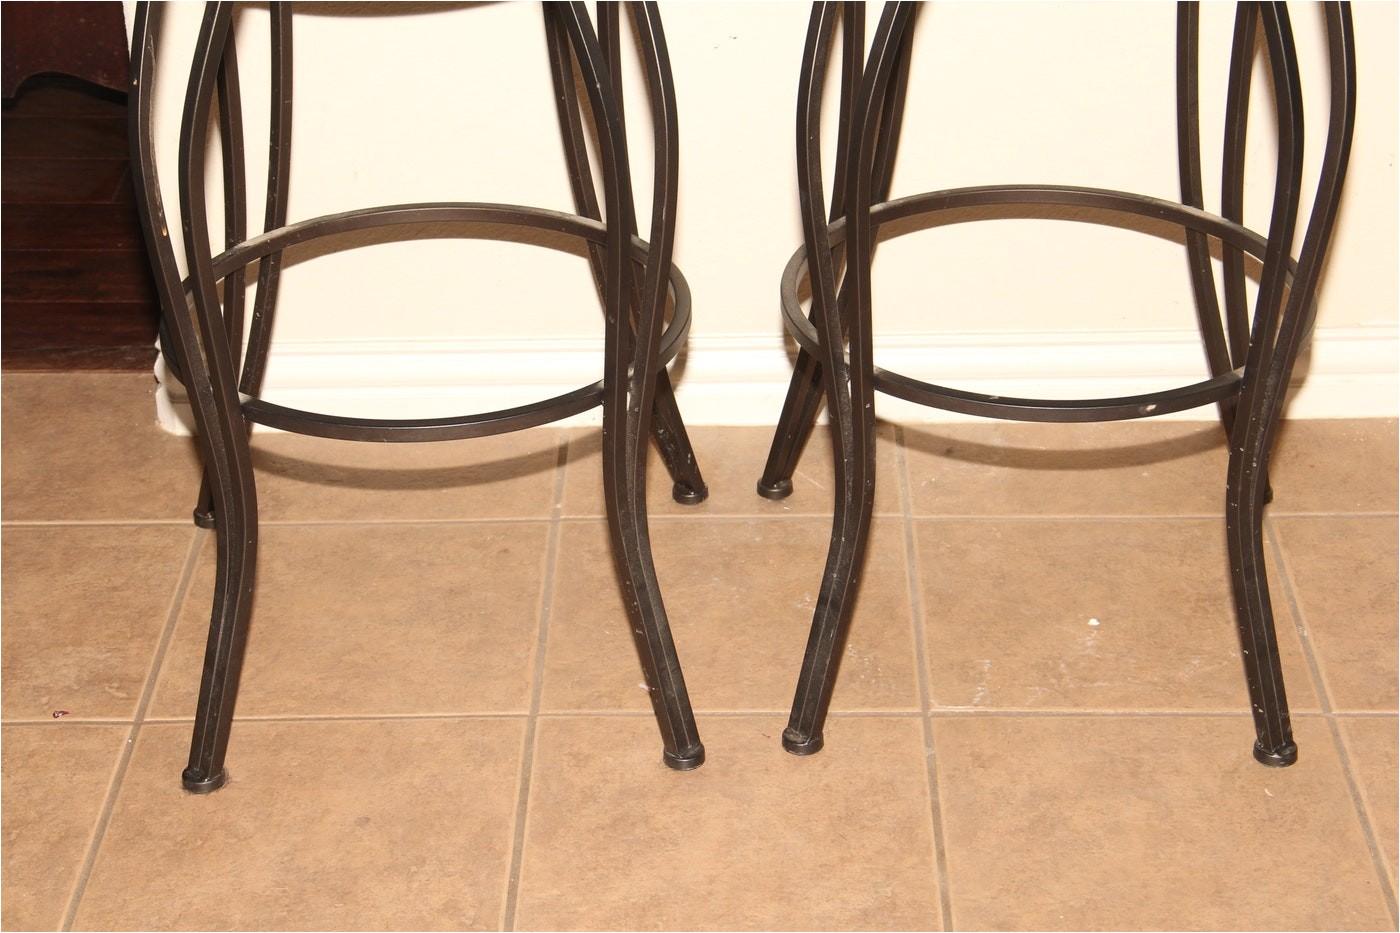 3553154 cheyenne home furnishings pair of wrought iron bar stools